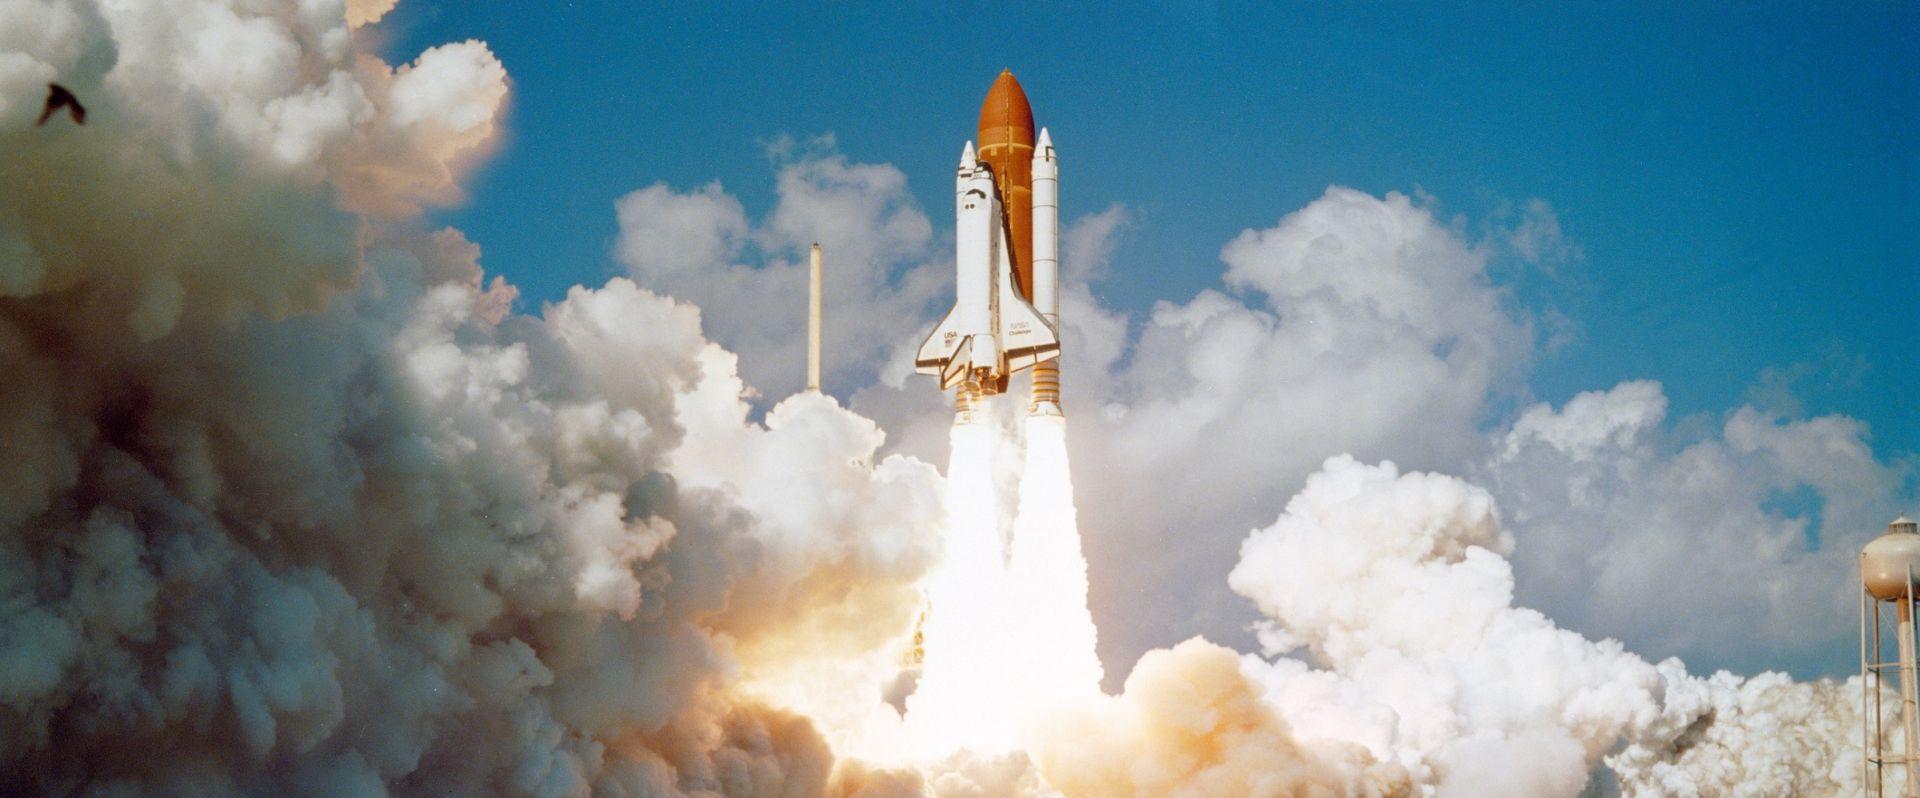 VIDEO: 'SVE JE STALO' Trideseta obljetnica katastrofe Challengera